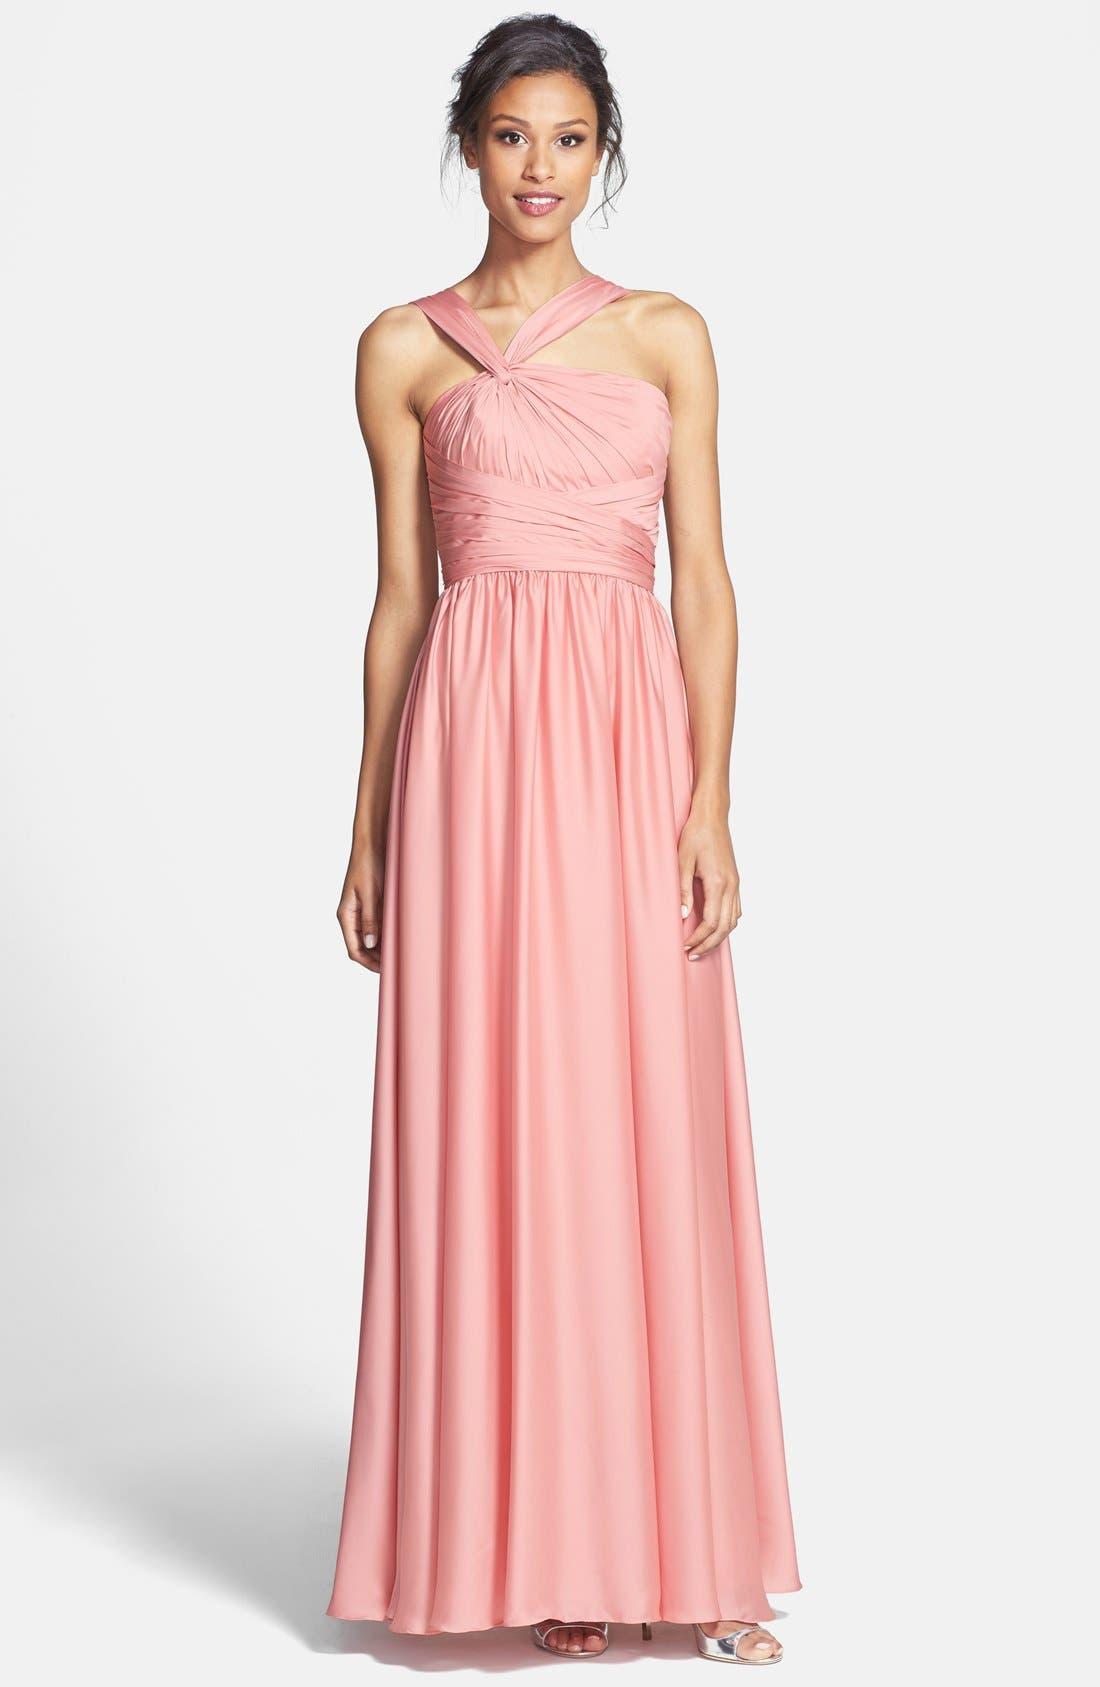 Alternate Image 1 Selected - Monique Lhuillier Bridesmaids Twist Shoulder Satin Chiffon Gown (Nordstrom Exclusive)